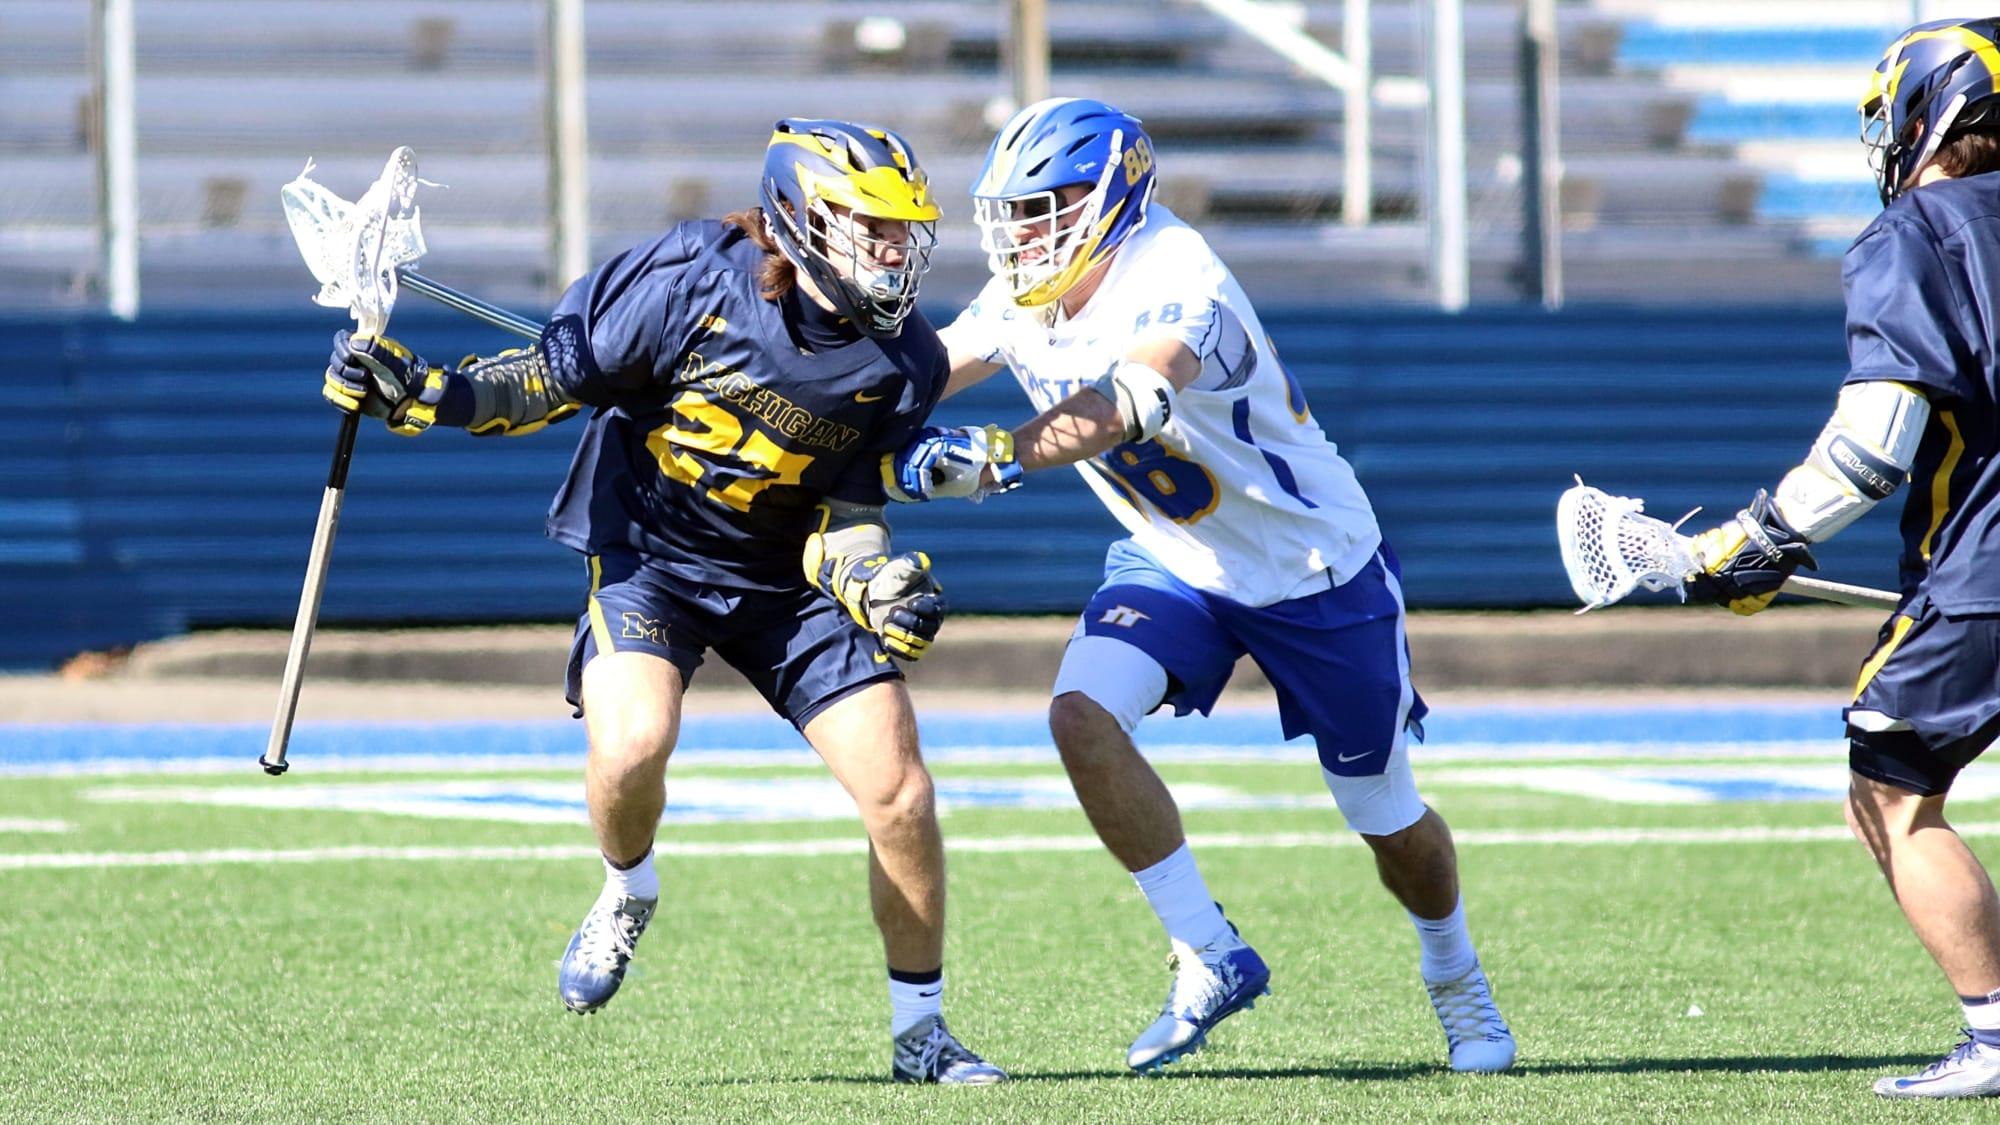 university of michigan hofstra ncaa men's lacrosse ncaa lacrosse college lacrosse